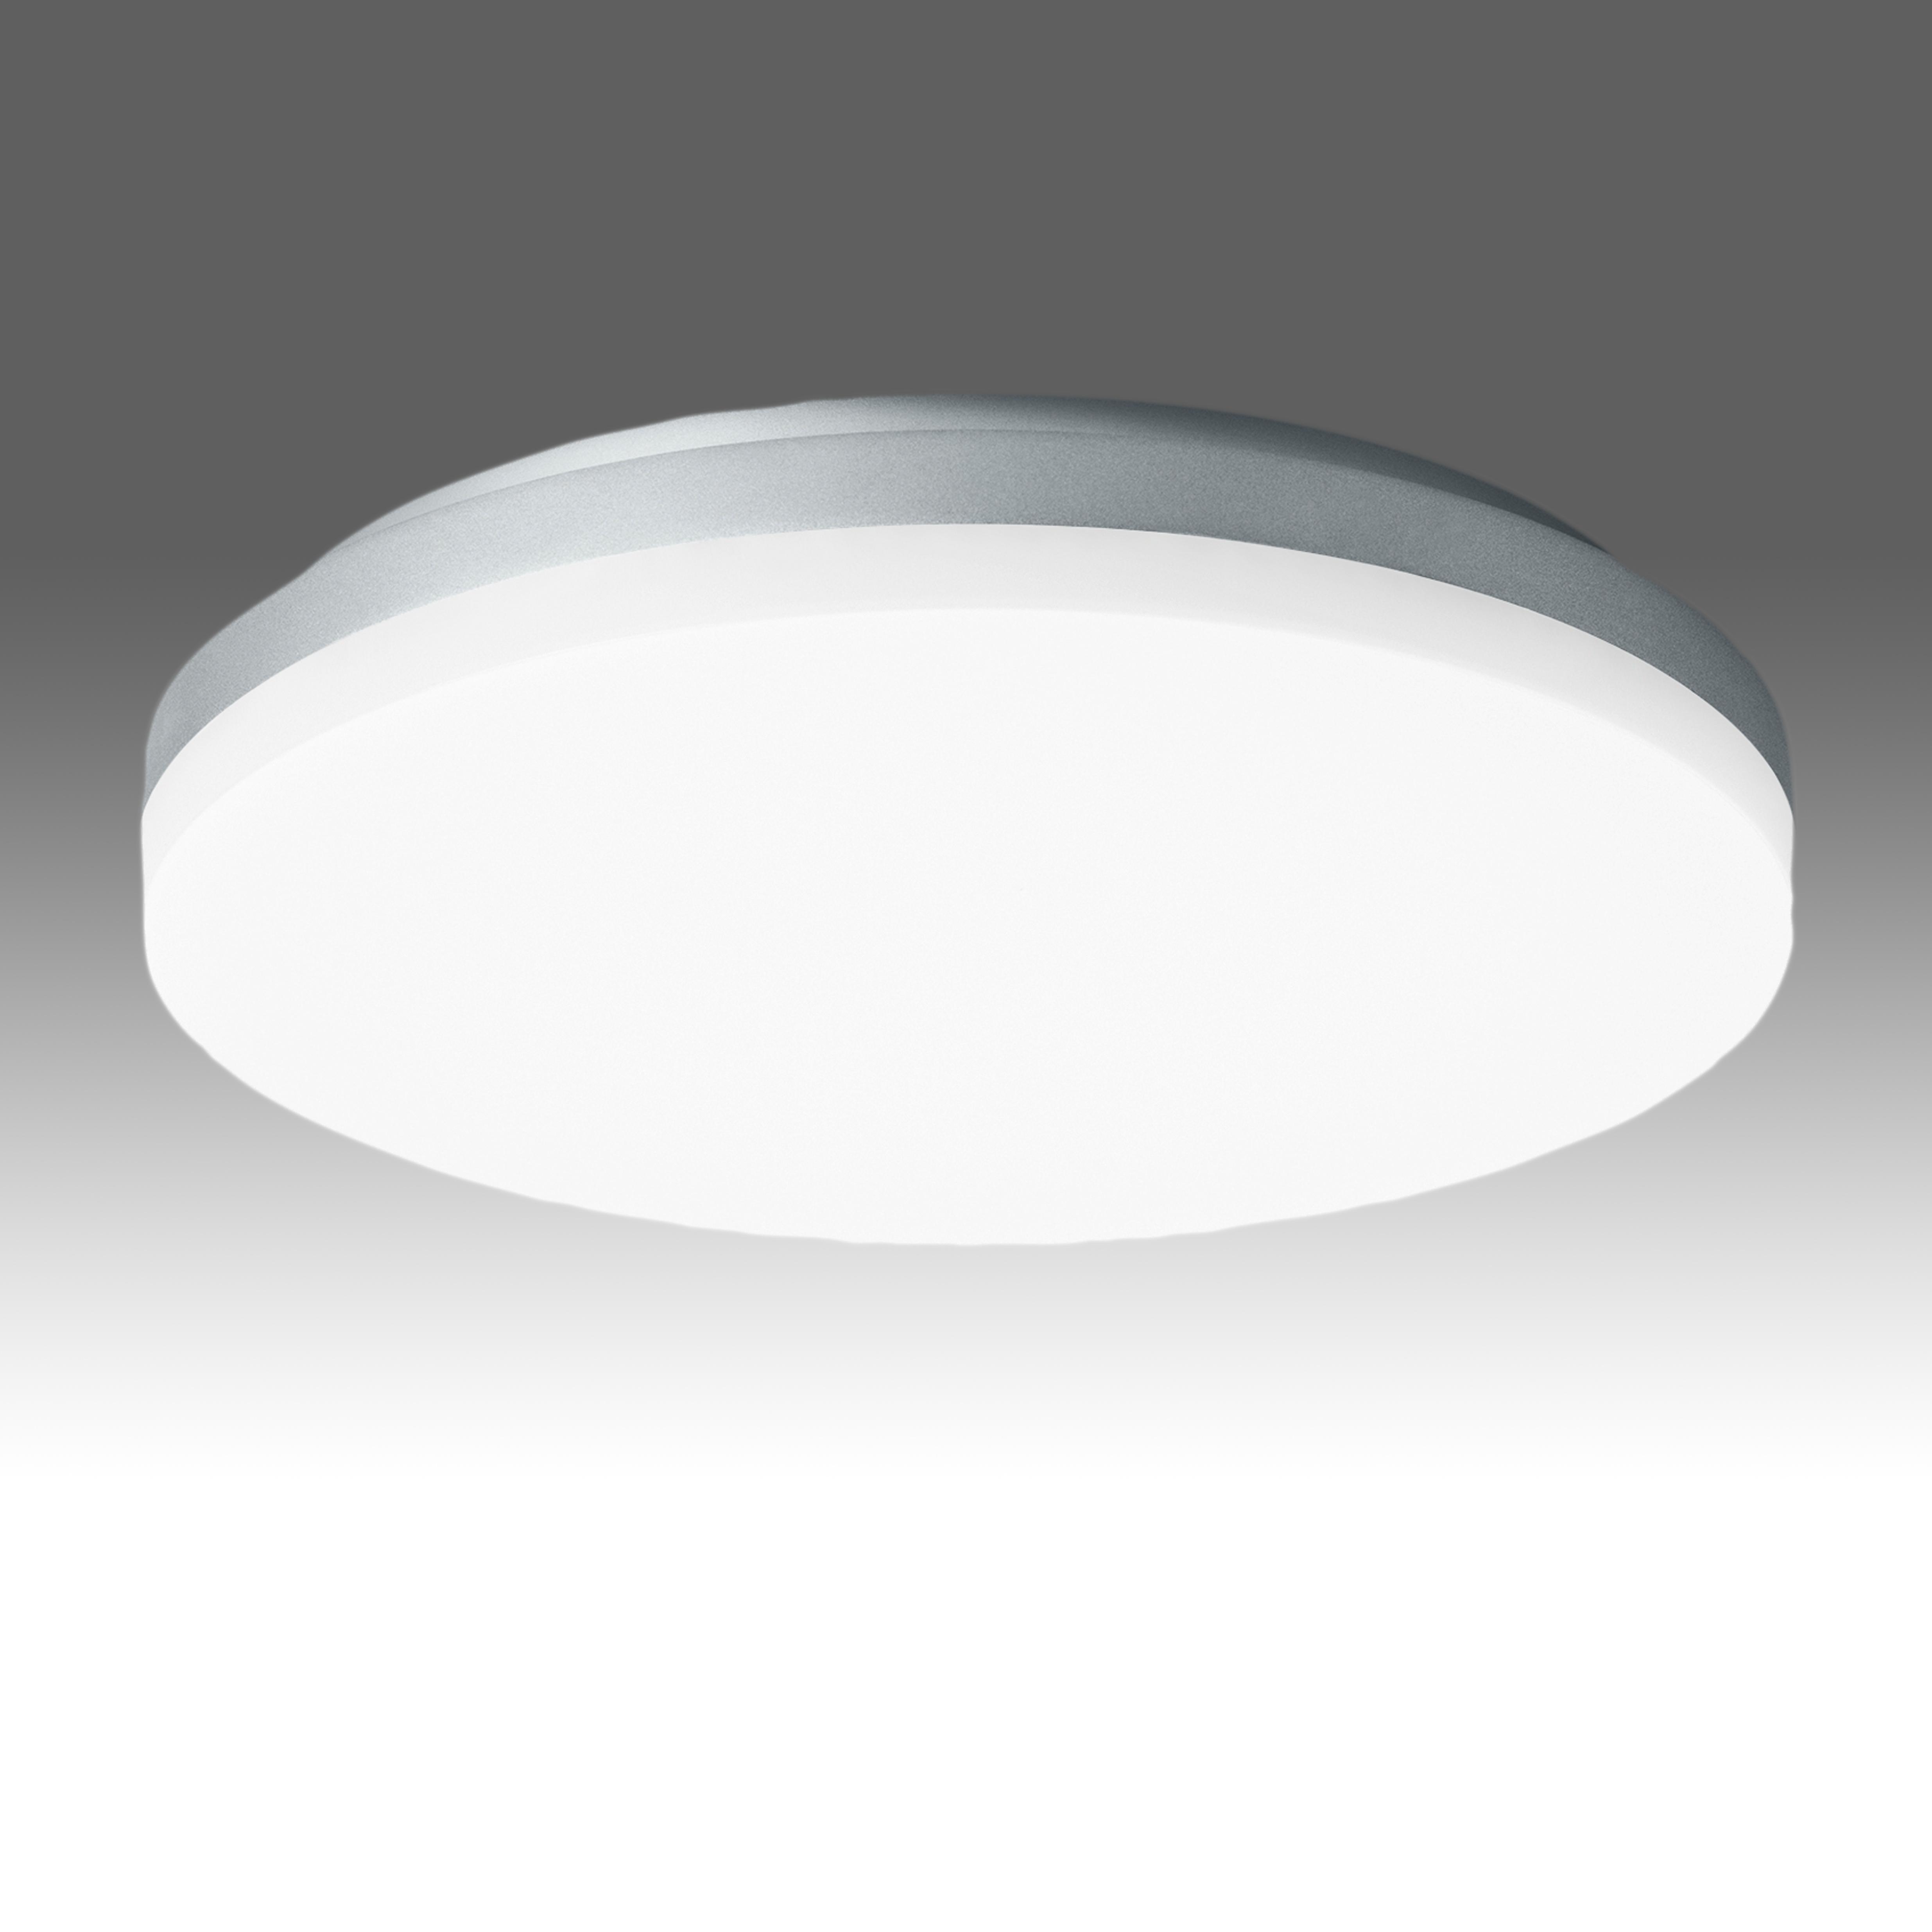 1 Stk Elegance Round III 27W 2800lm 3000K Sensor IP20 silber LILE0018--